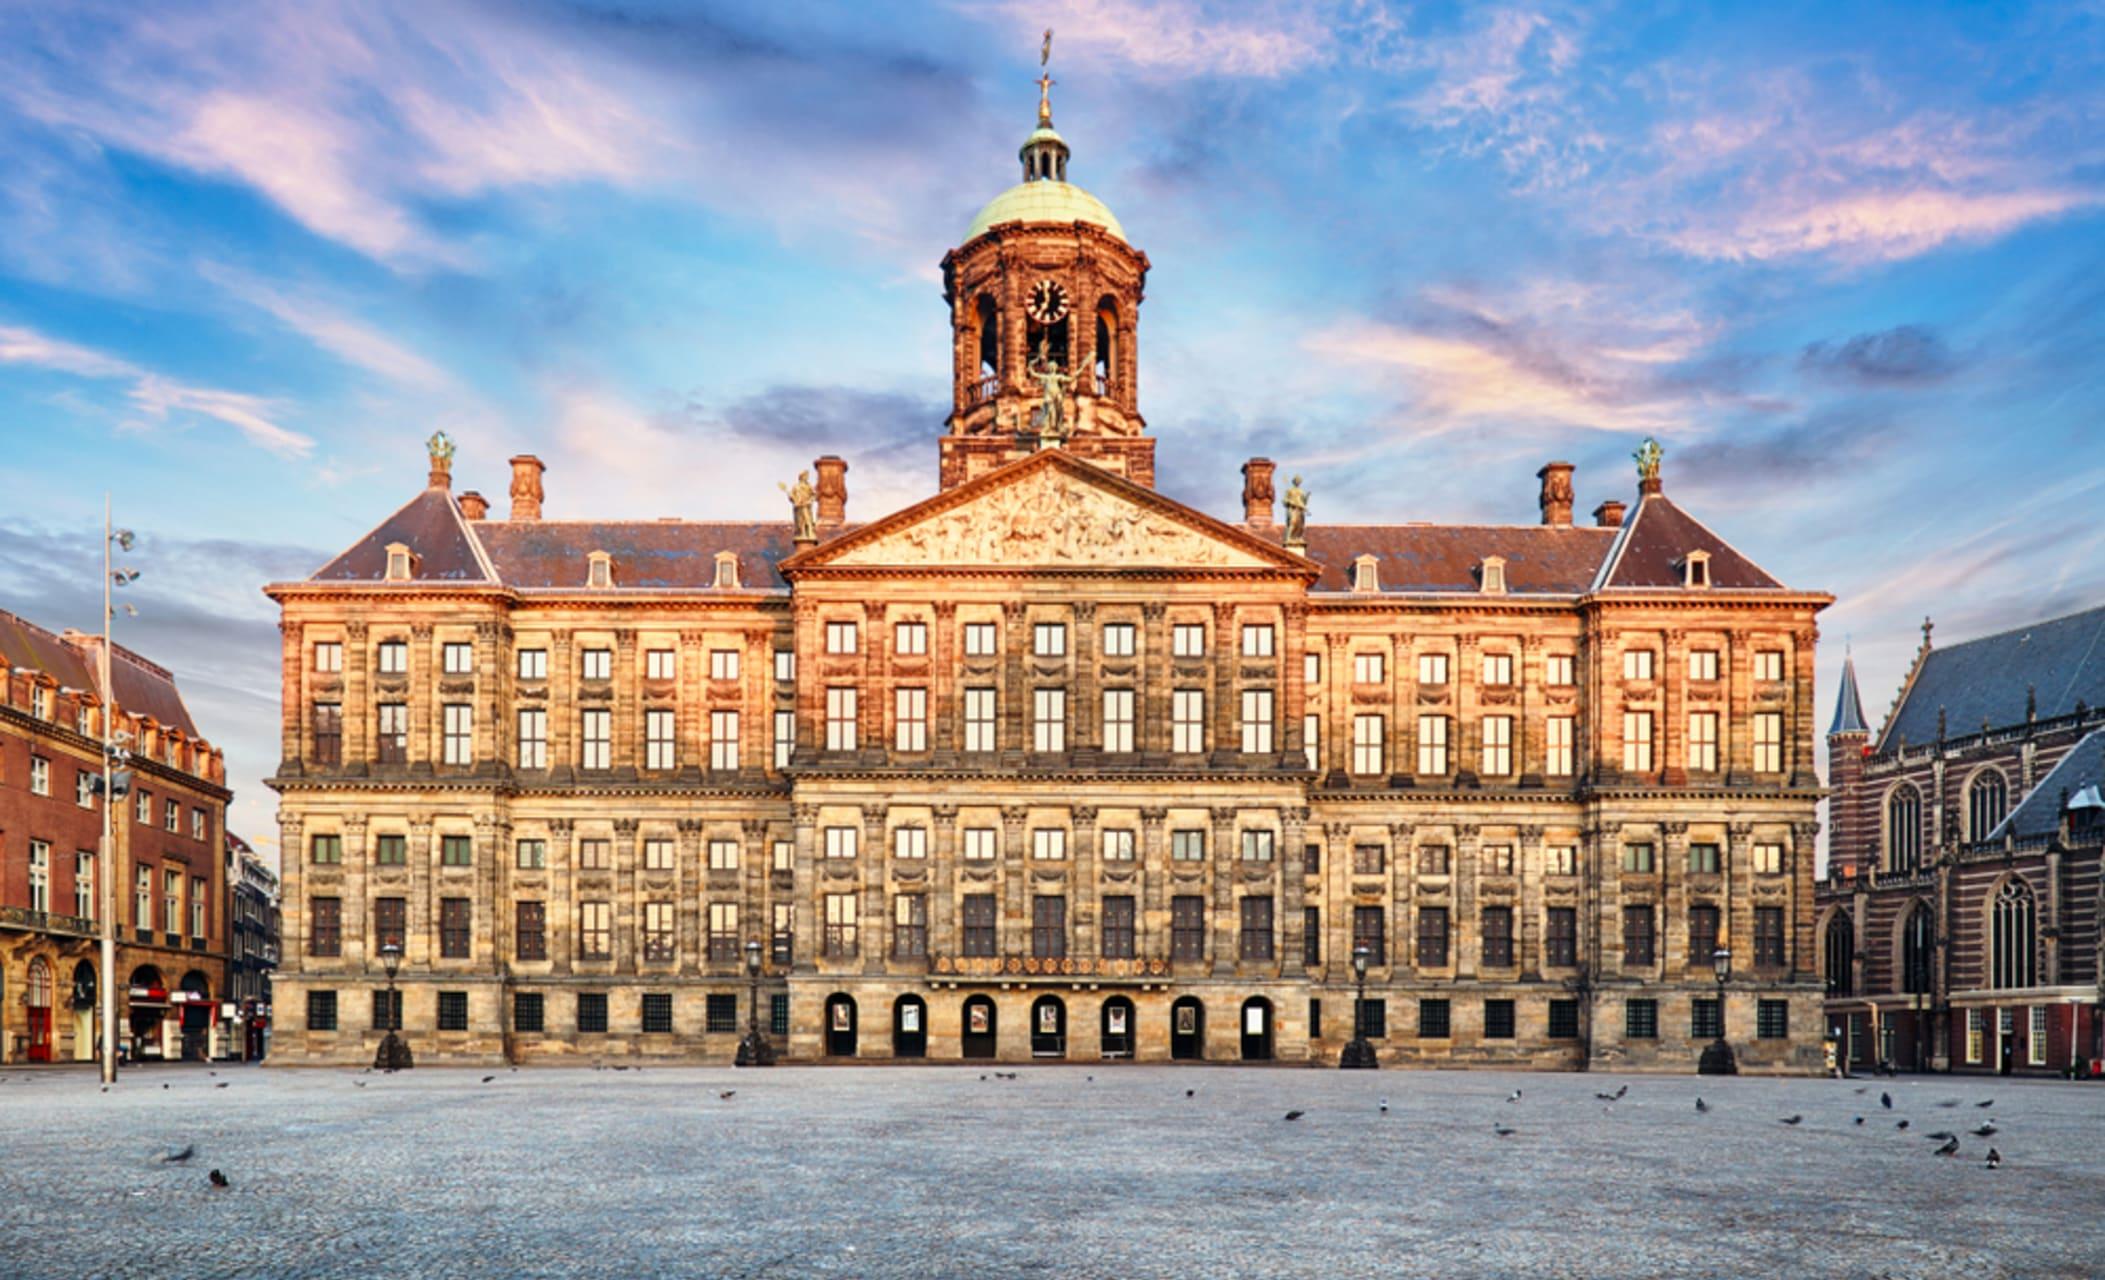 Amsterdam - Around Dam Square: Where it all Started in Amsterdam